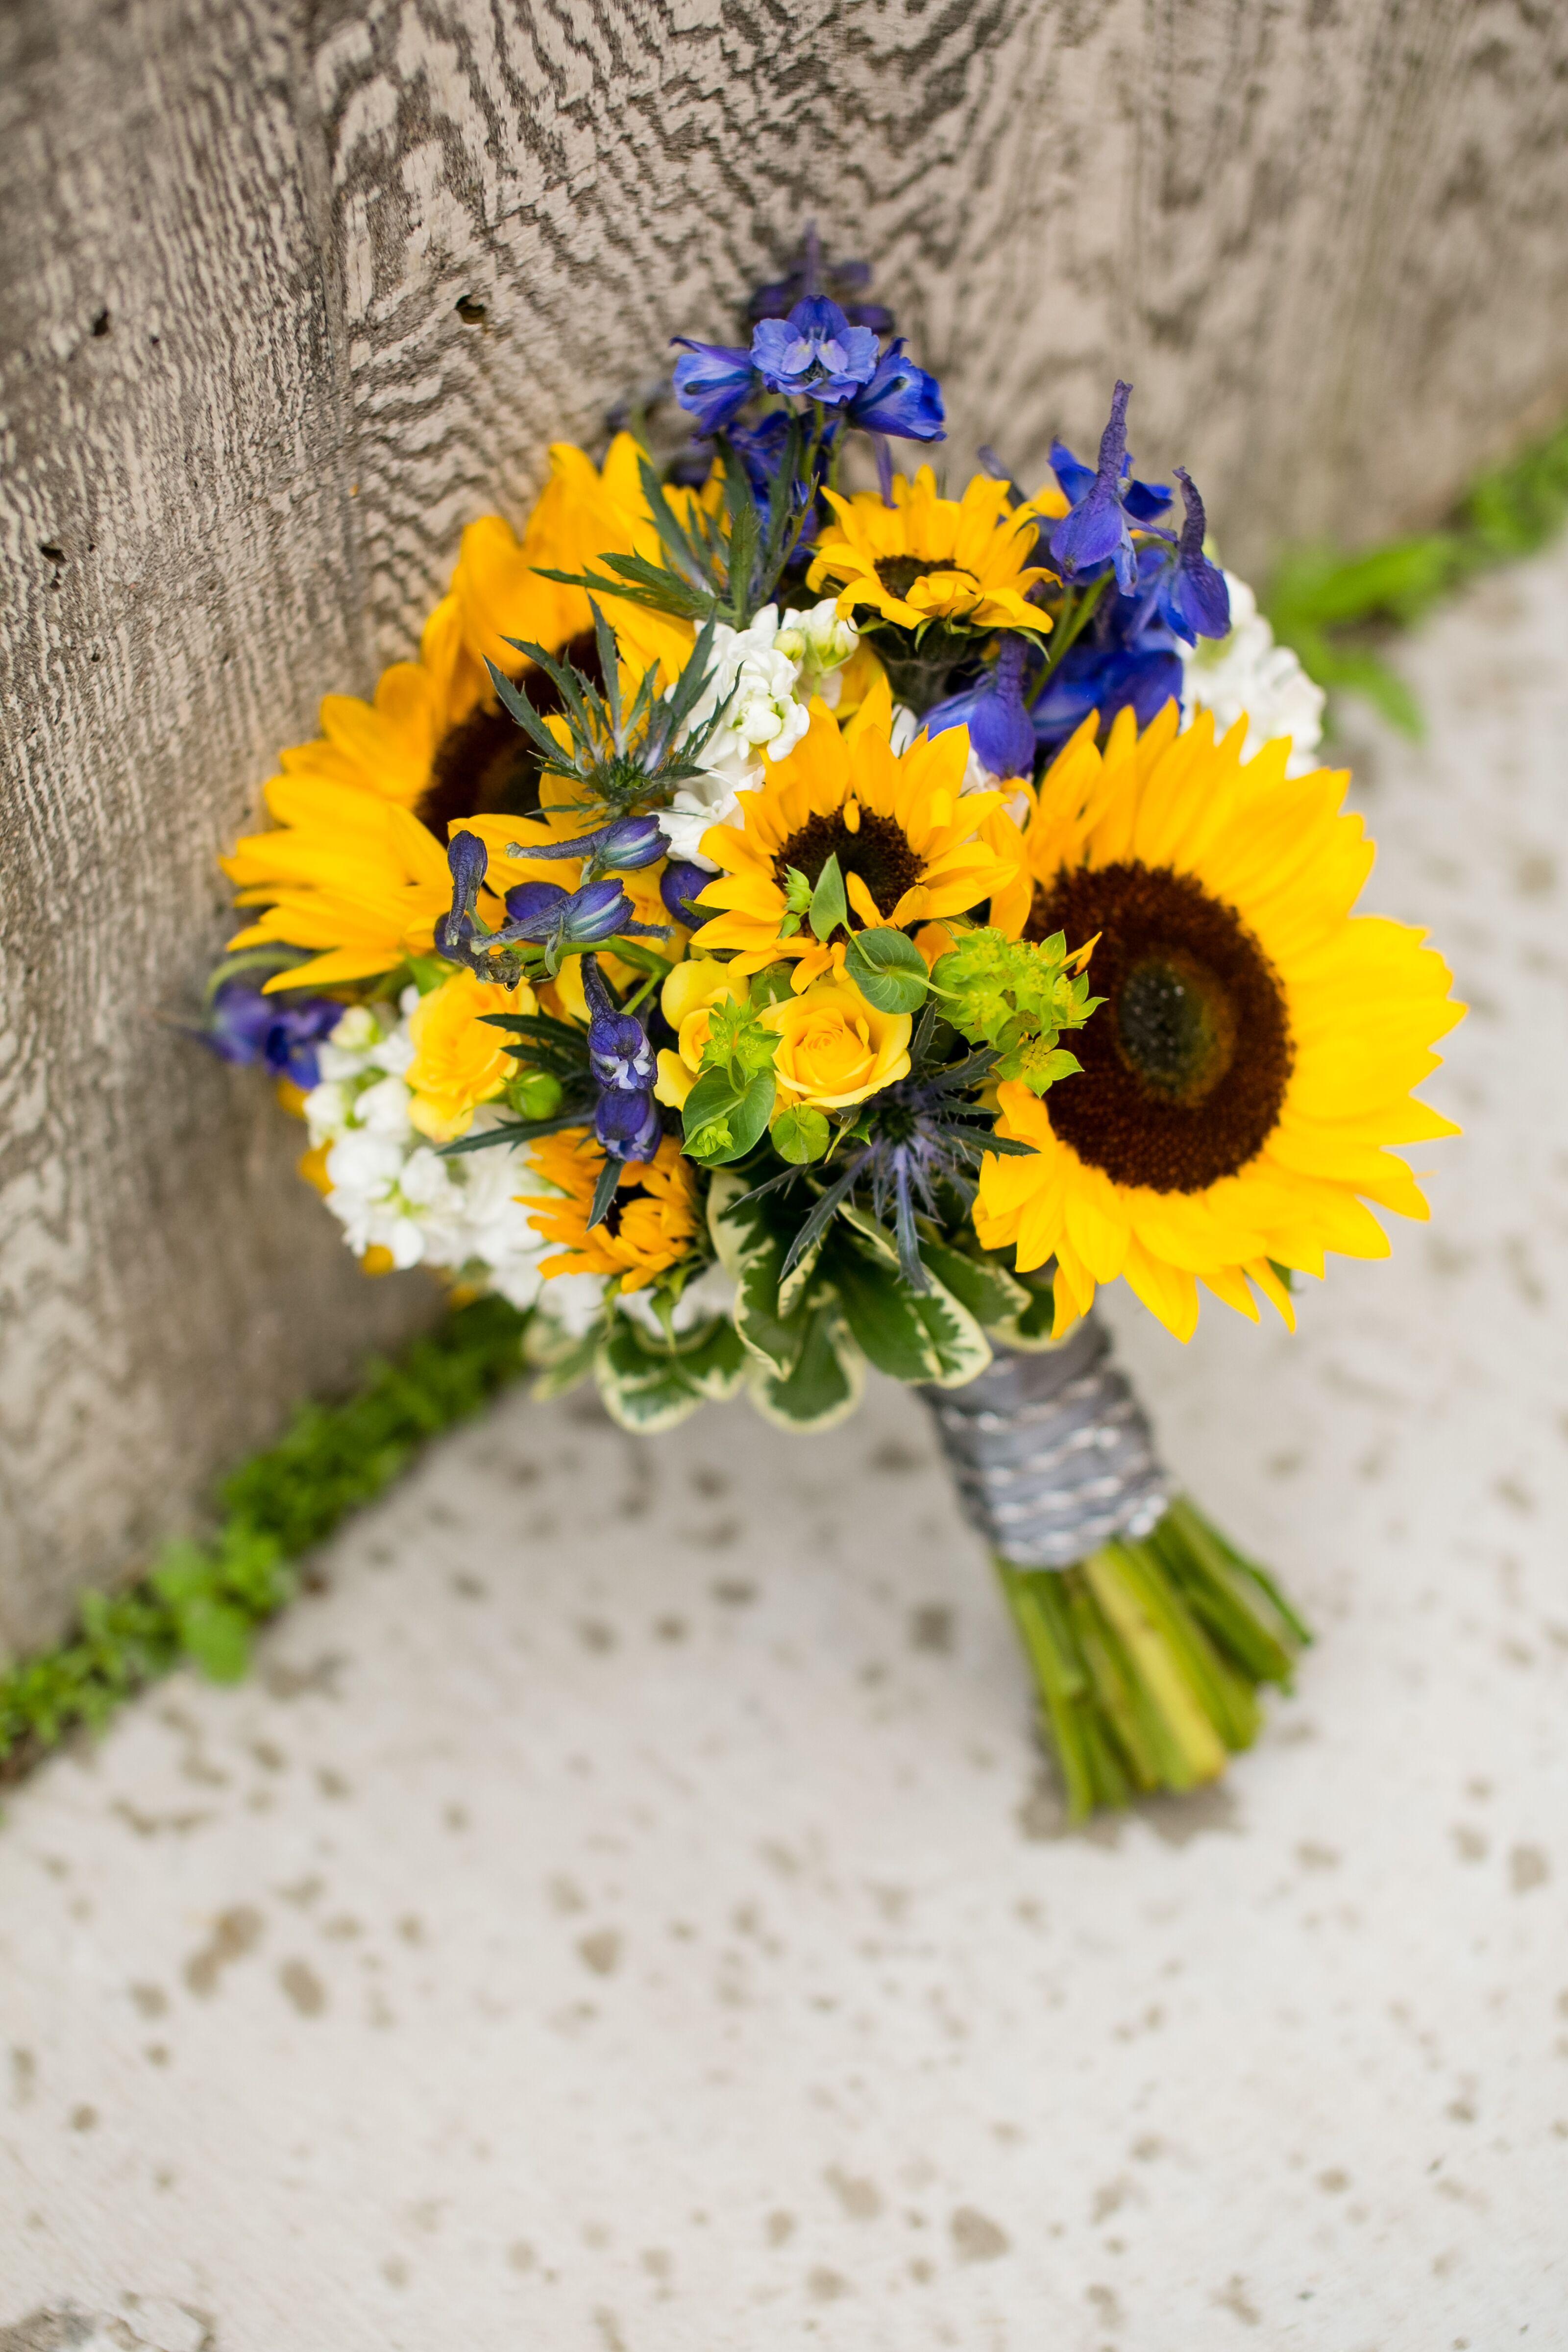 Iris flower wedding flower arrangements bouquet with sunflowers irises and stock flowers mightylinksfo